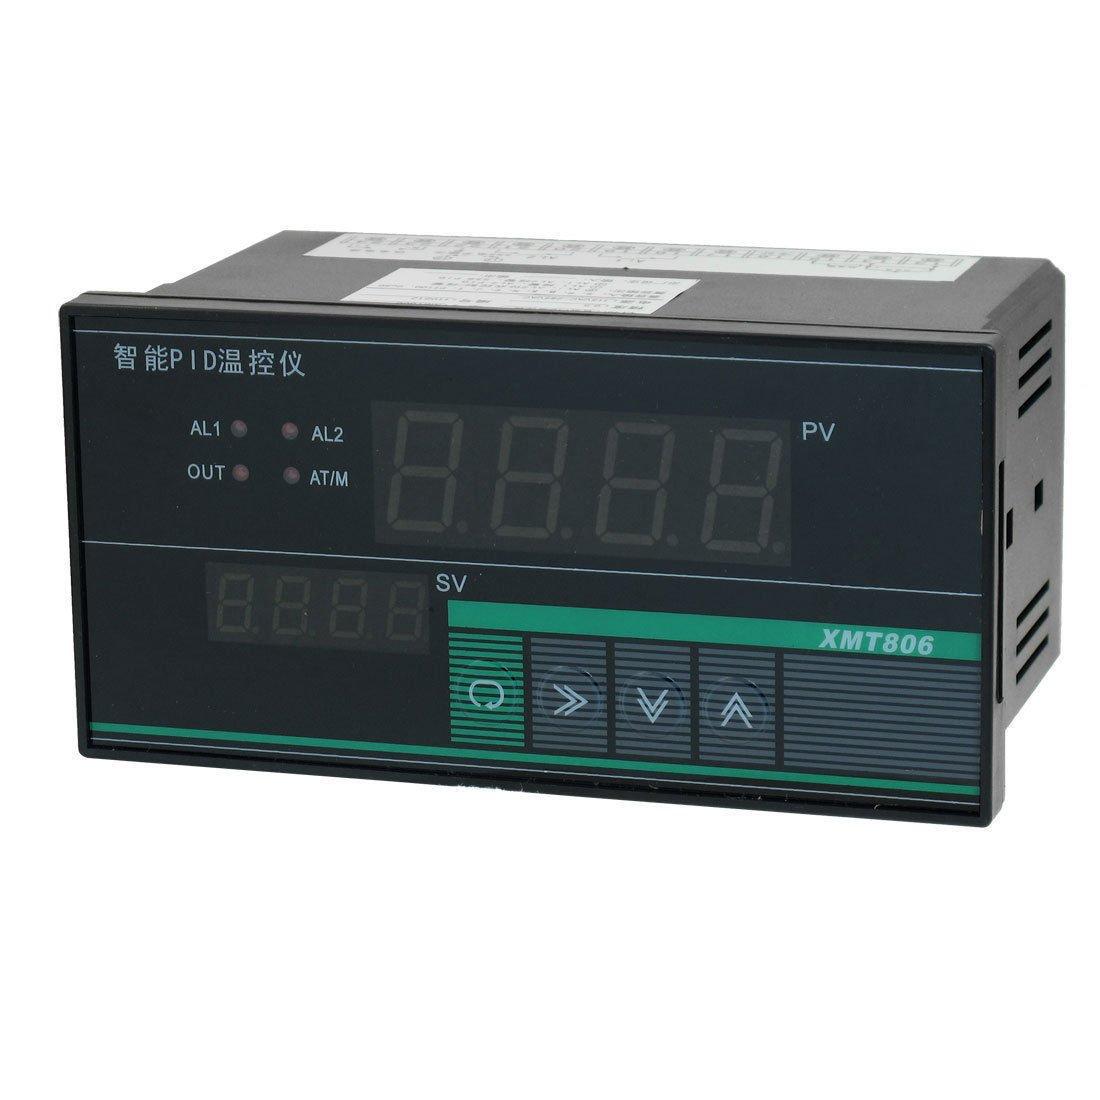 XMT-806 SSR Output PV SV Digital Display Controller Temperature Control Meter